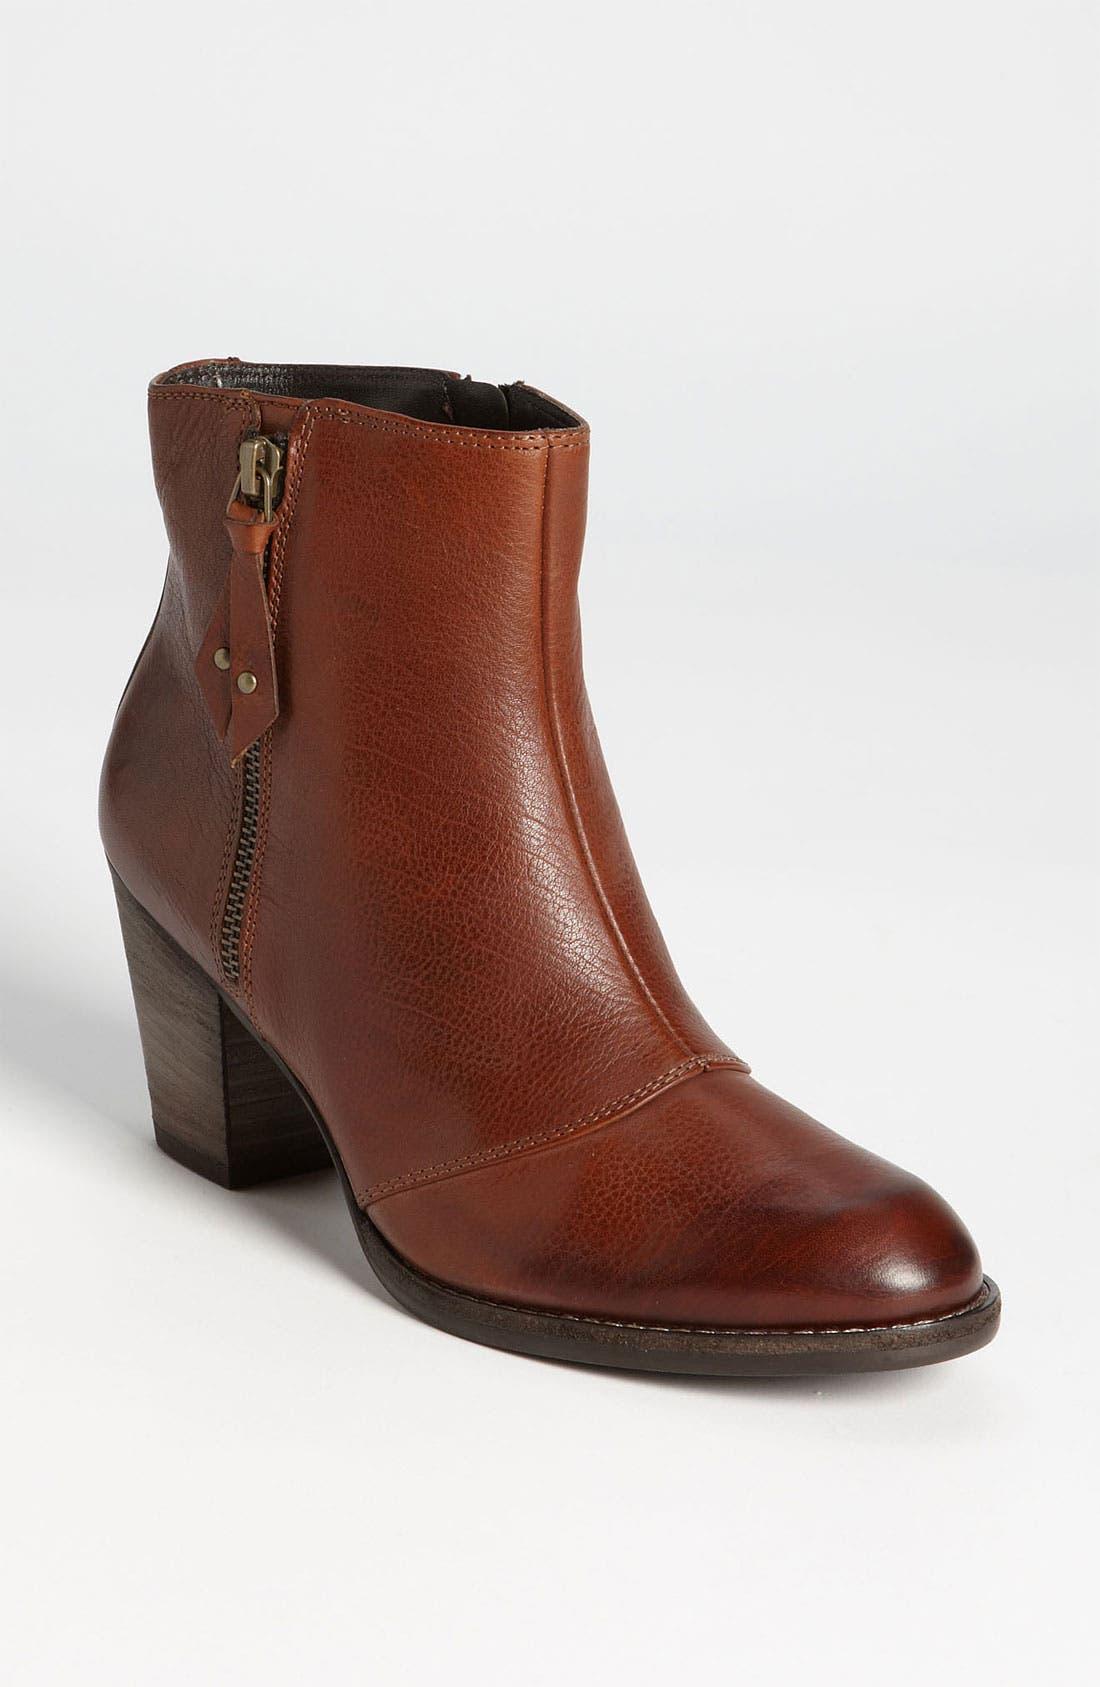 Alternate Image 1 Selected - Paul Green 'Natick' Boot